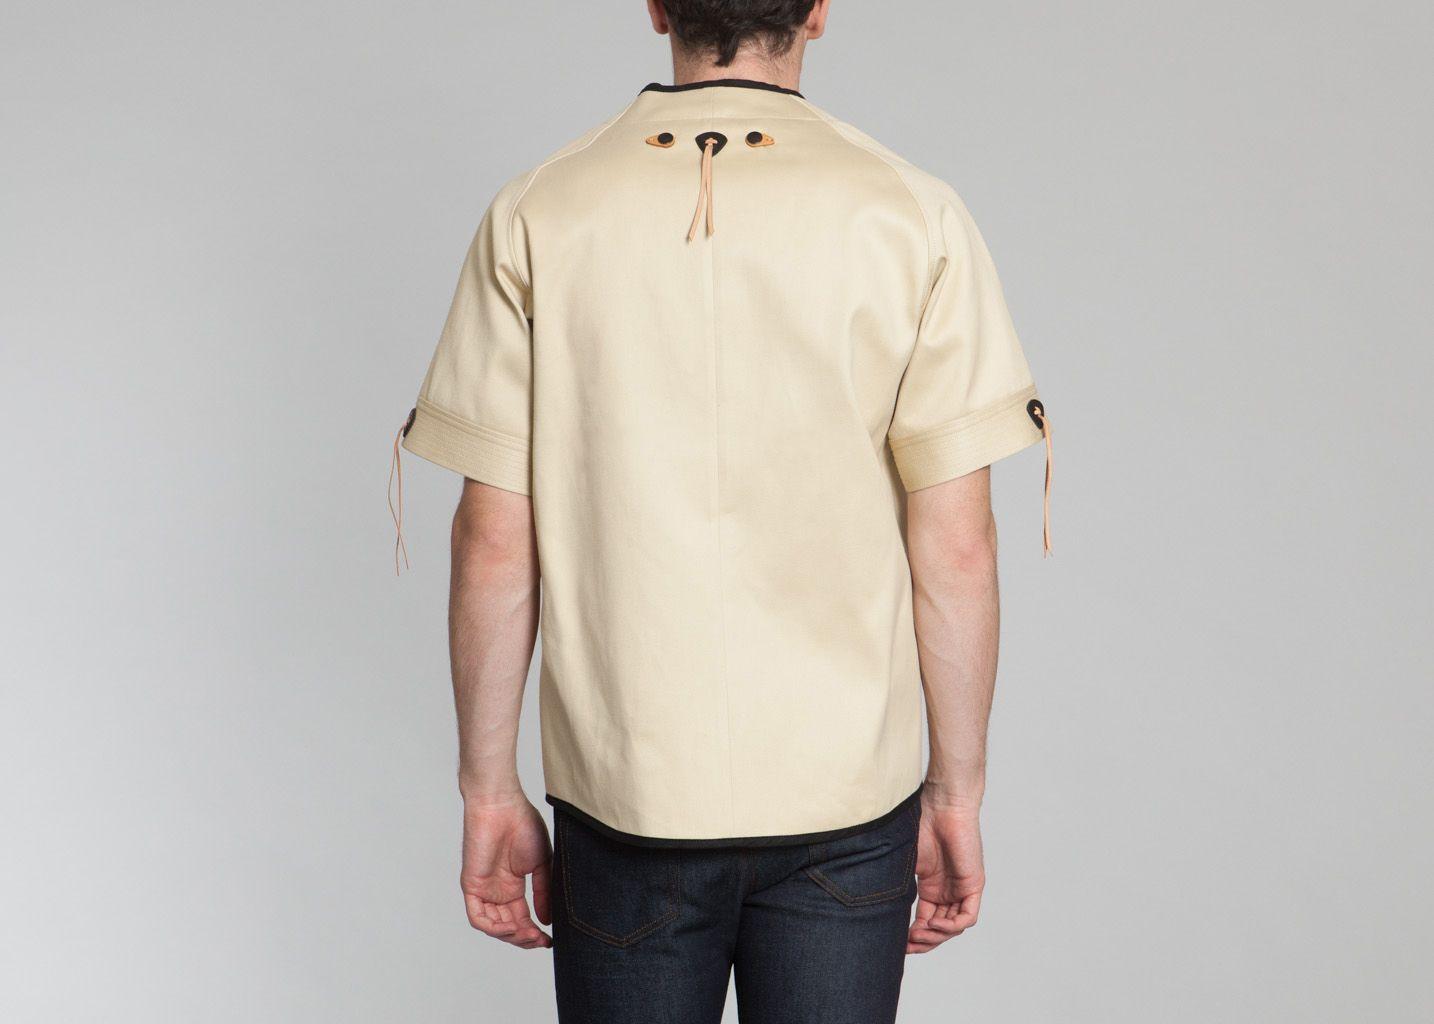 chemise baseball hoon beige en vente chez l 39 exception. Black Bedroom Furniture Sets. Home Design Ideas